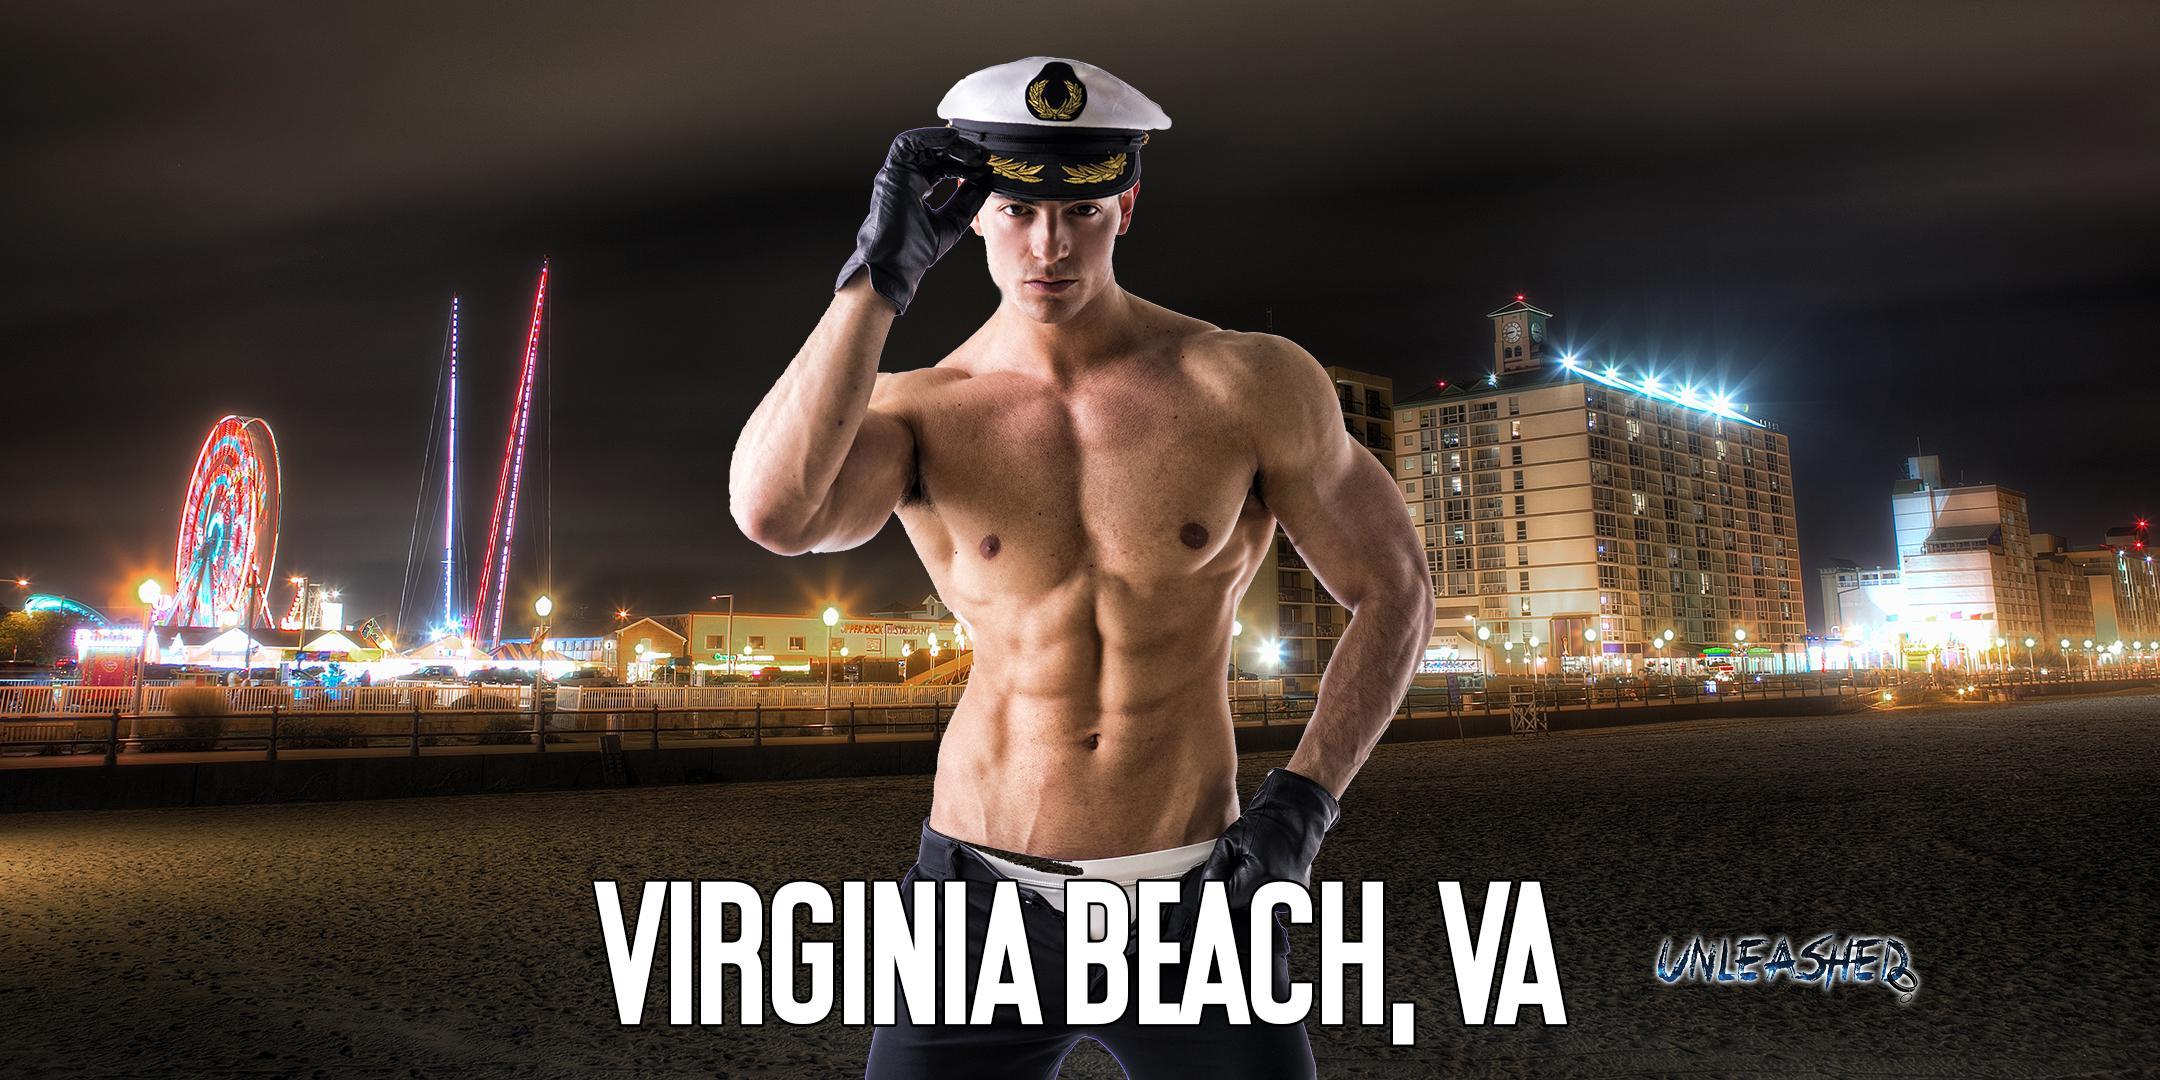 Virginia Beach Male Strippers - Professional Bachelorette